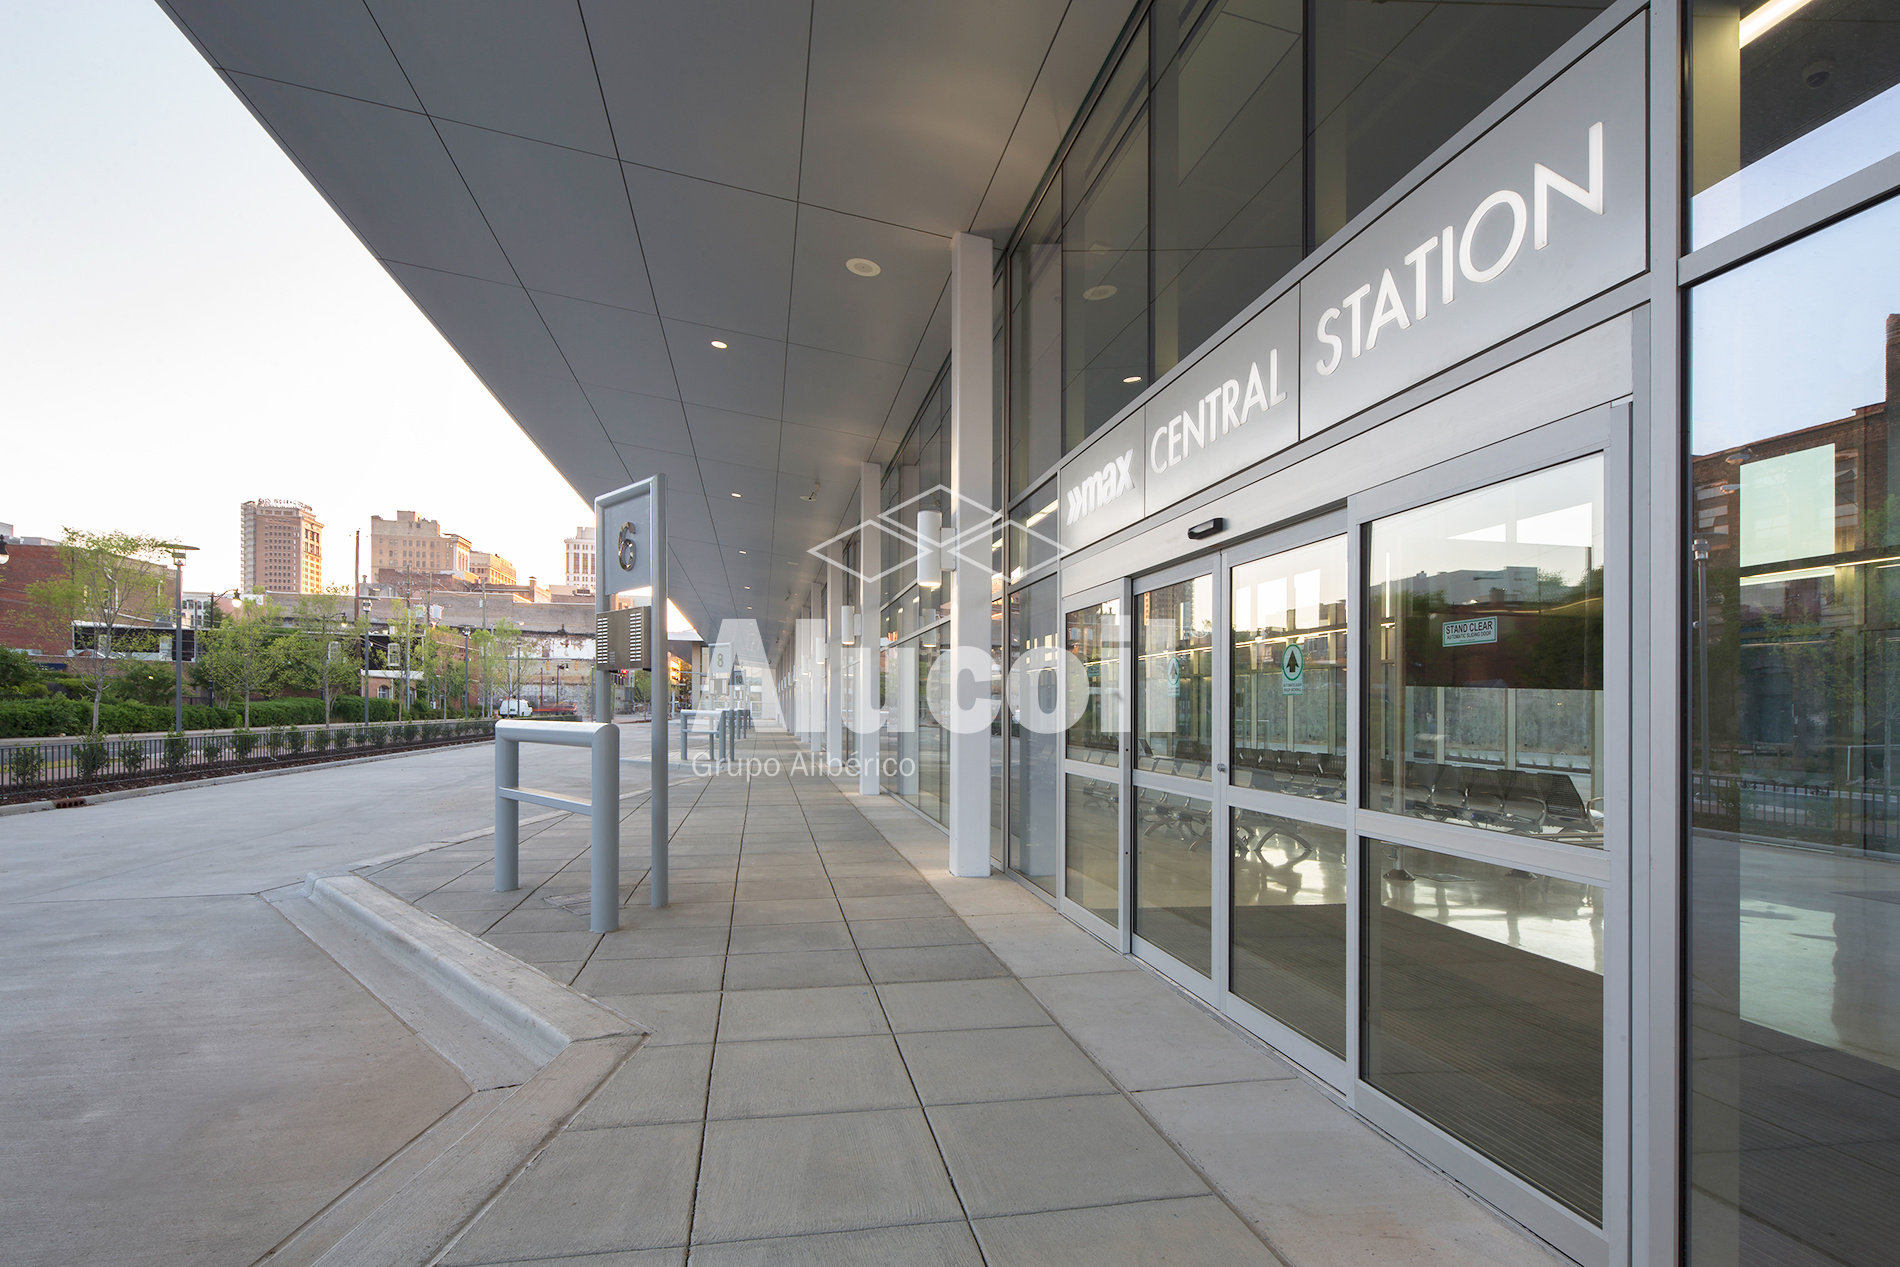 Birmingham Intermodal Terminal